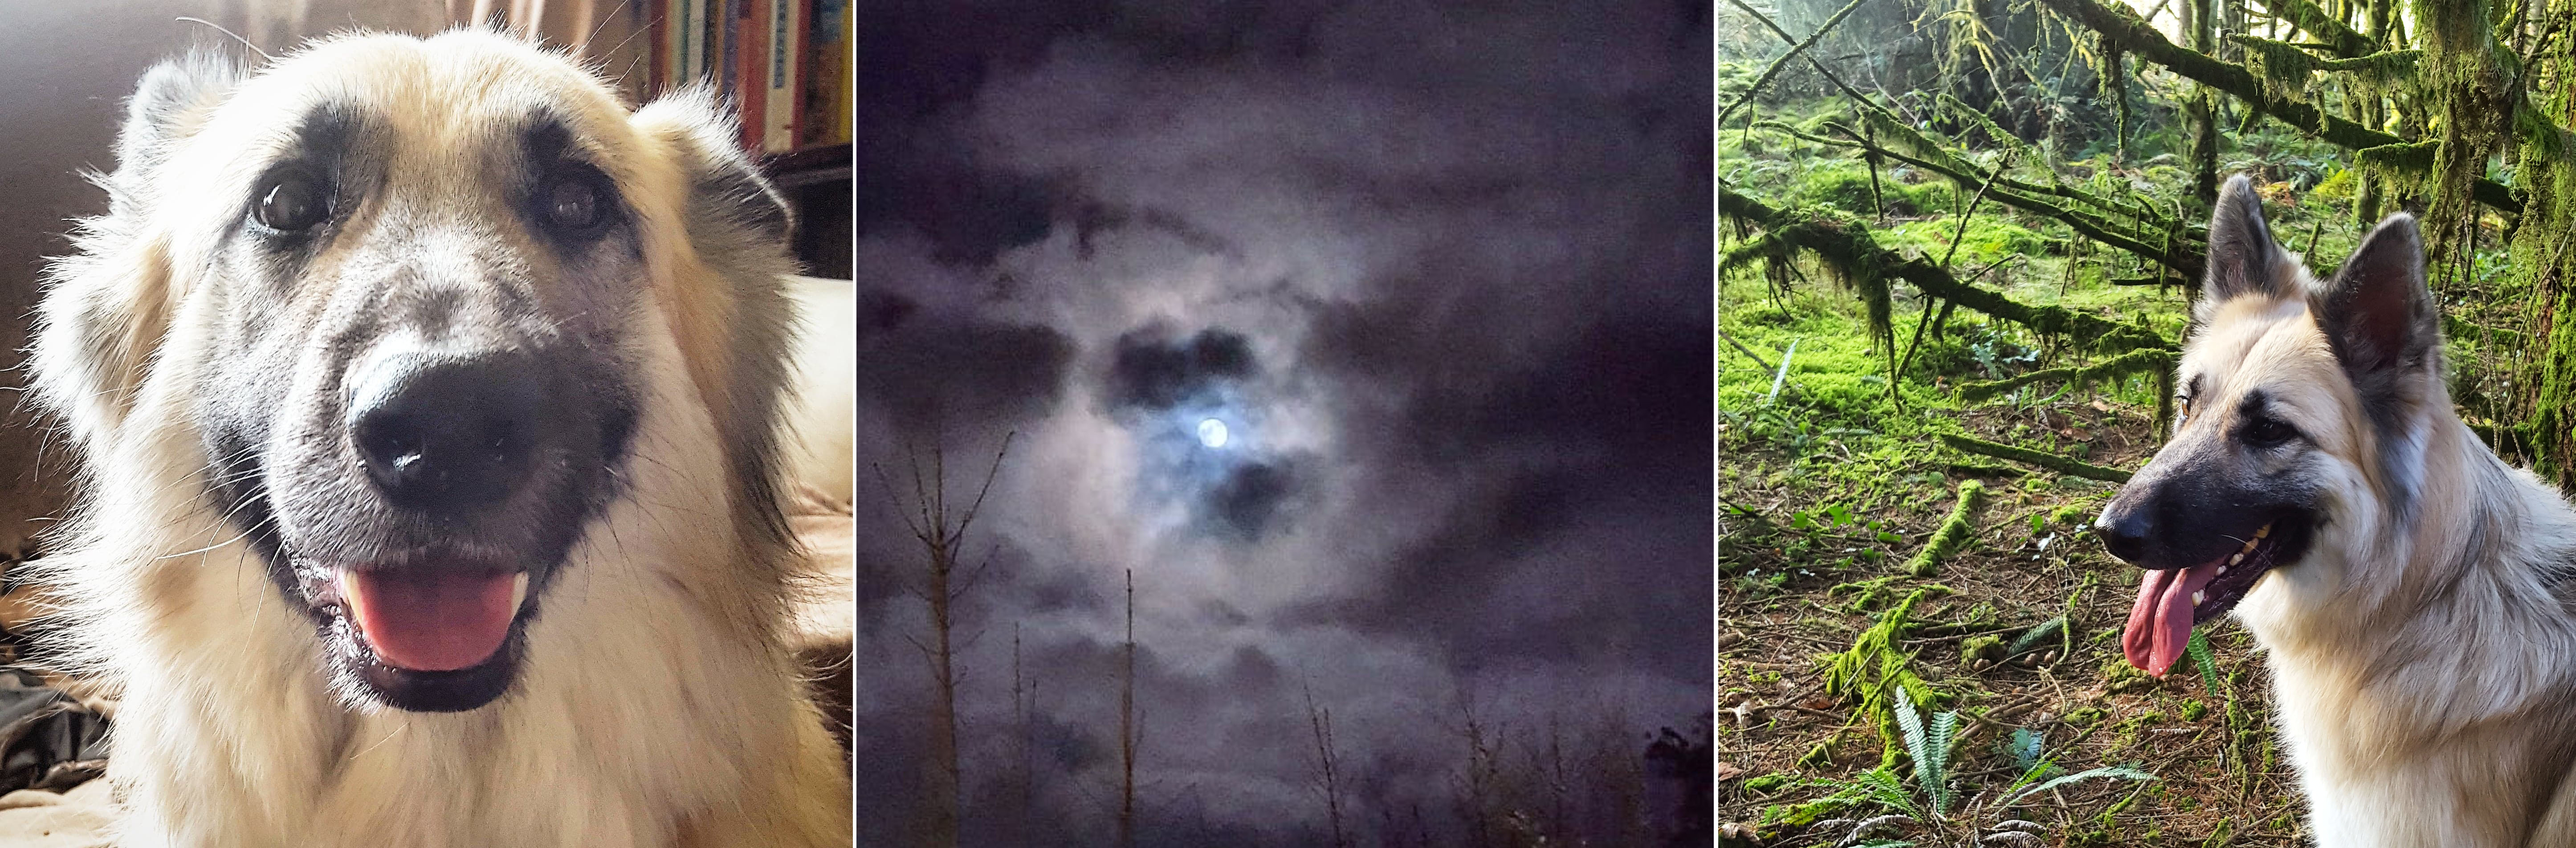 Kira - Snow Moon - Kira - The Last Krystallos